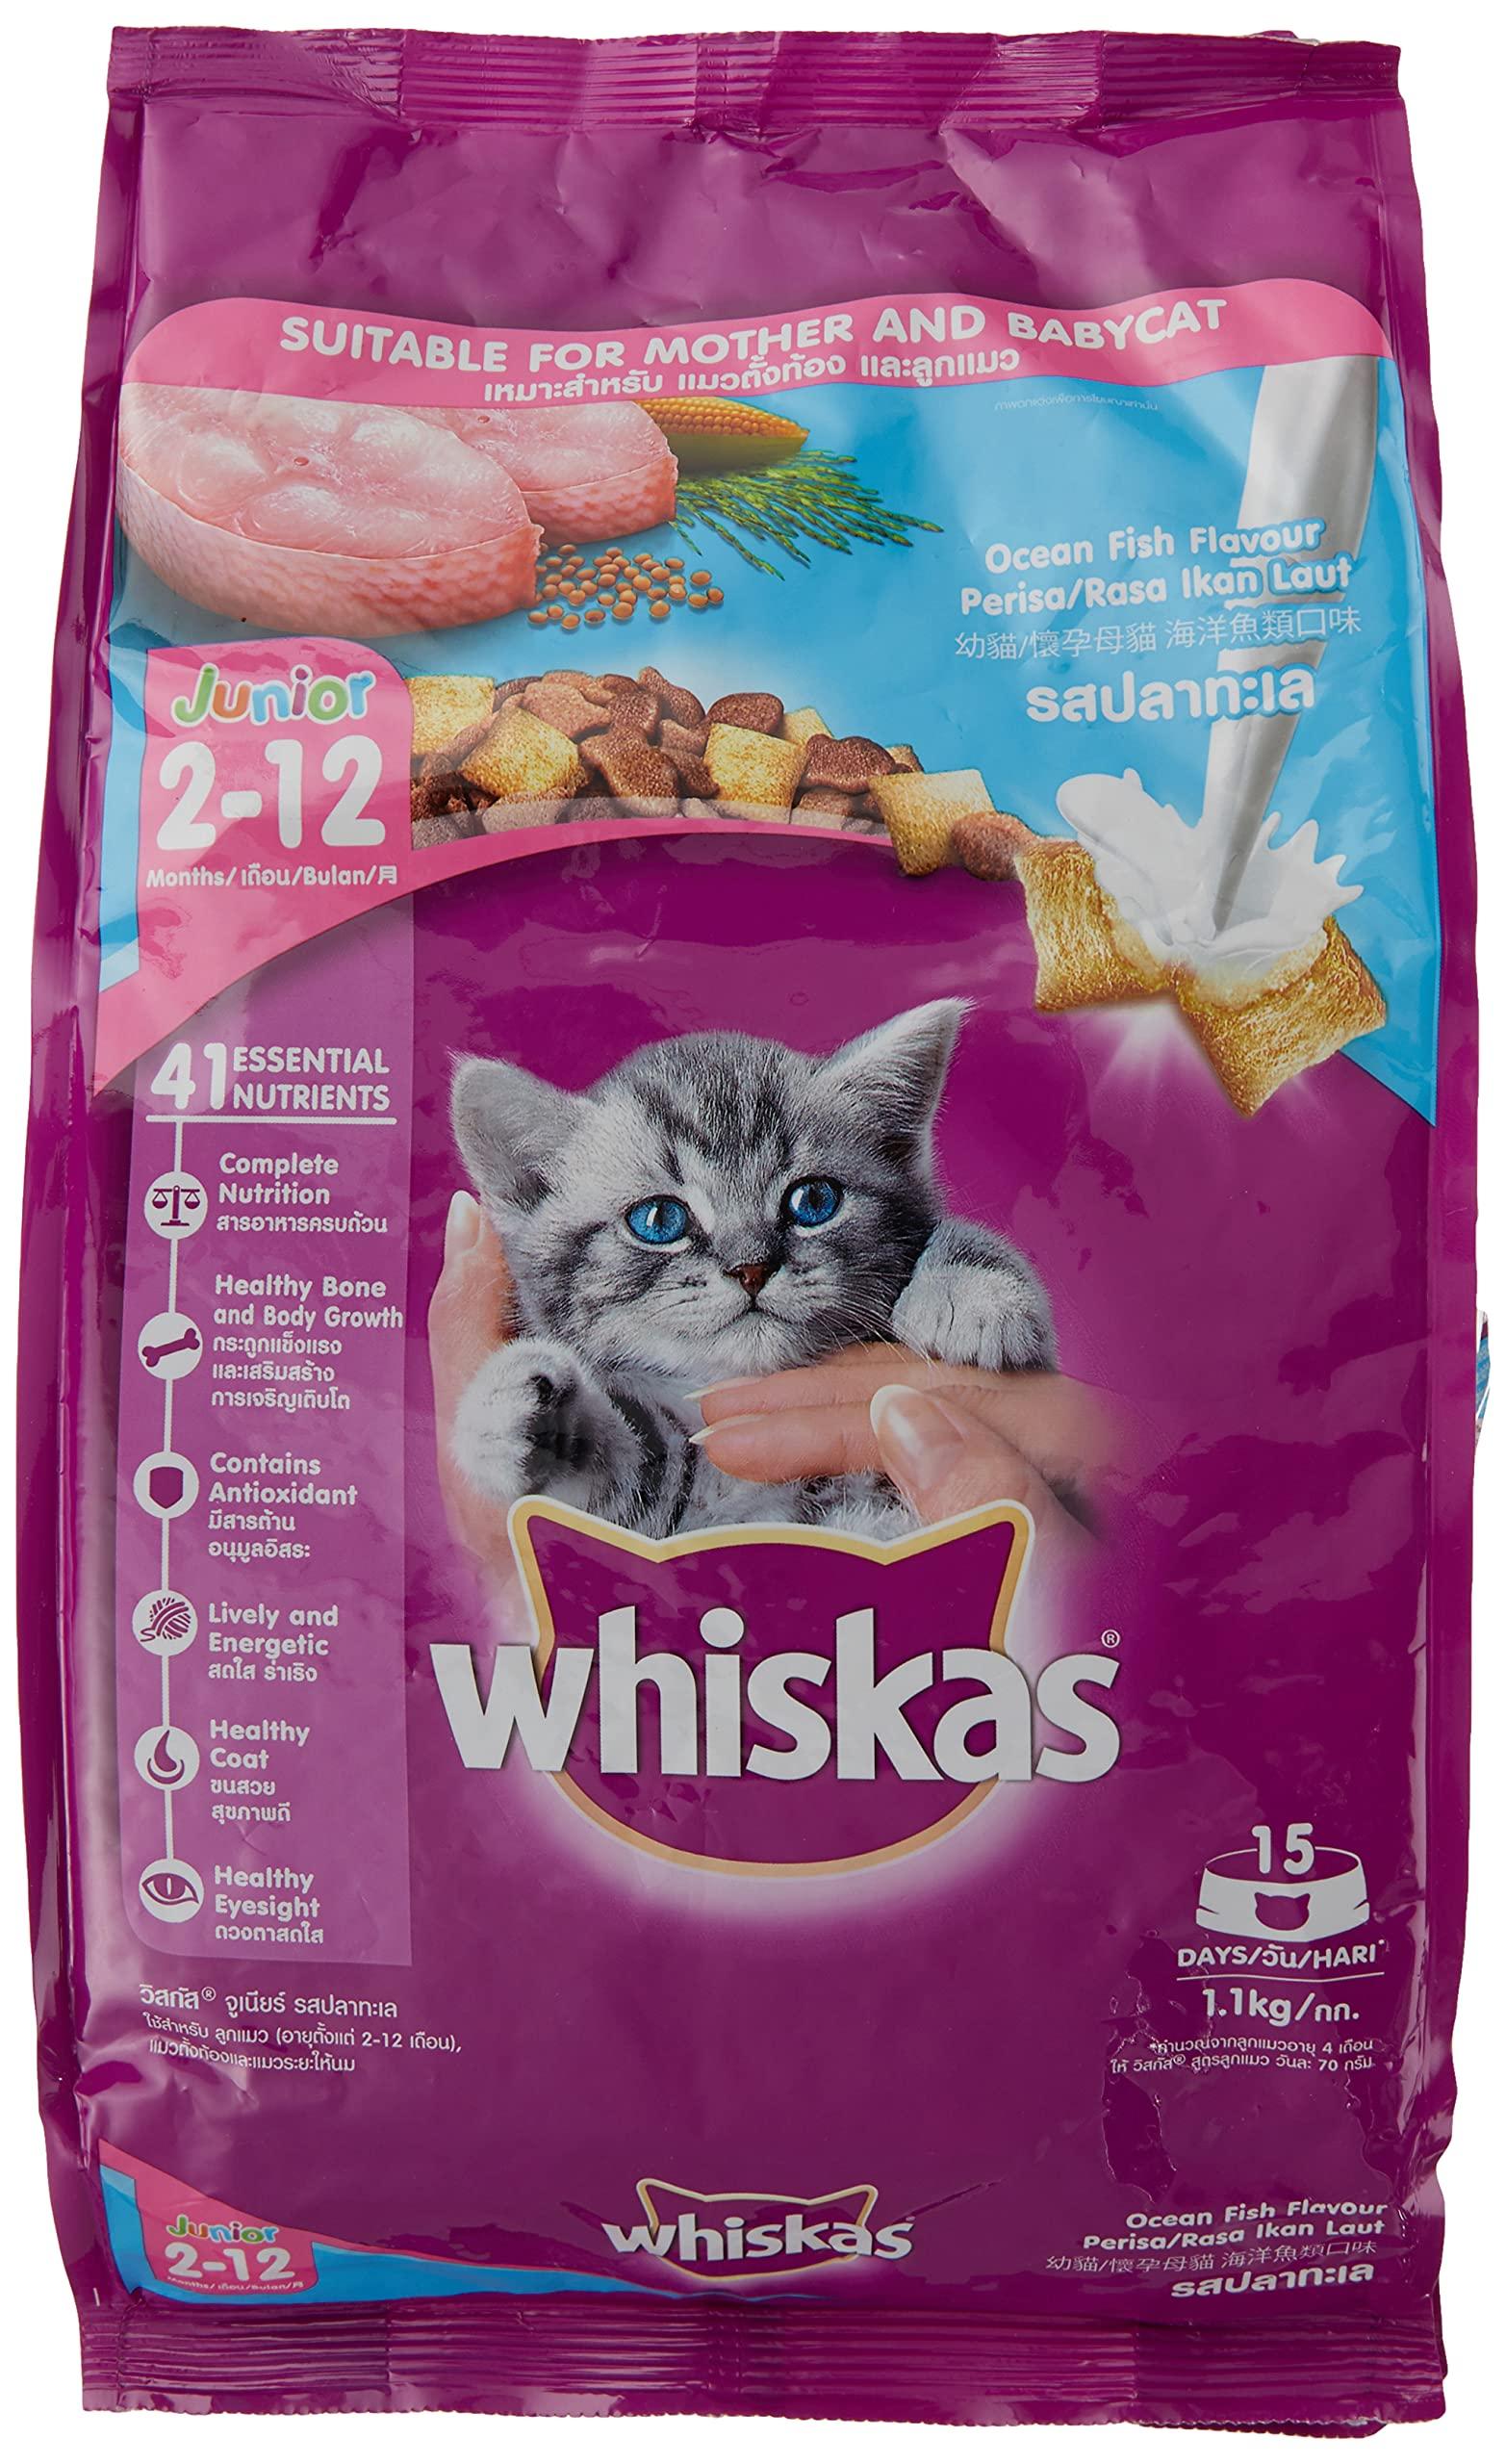 Whiskas Kitten (2-12 months) Dry Cat Food , Ocean Fish, 1.1kg Pack